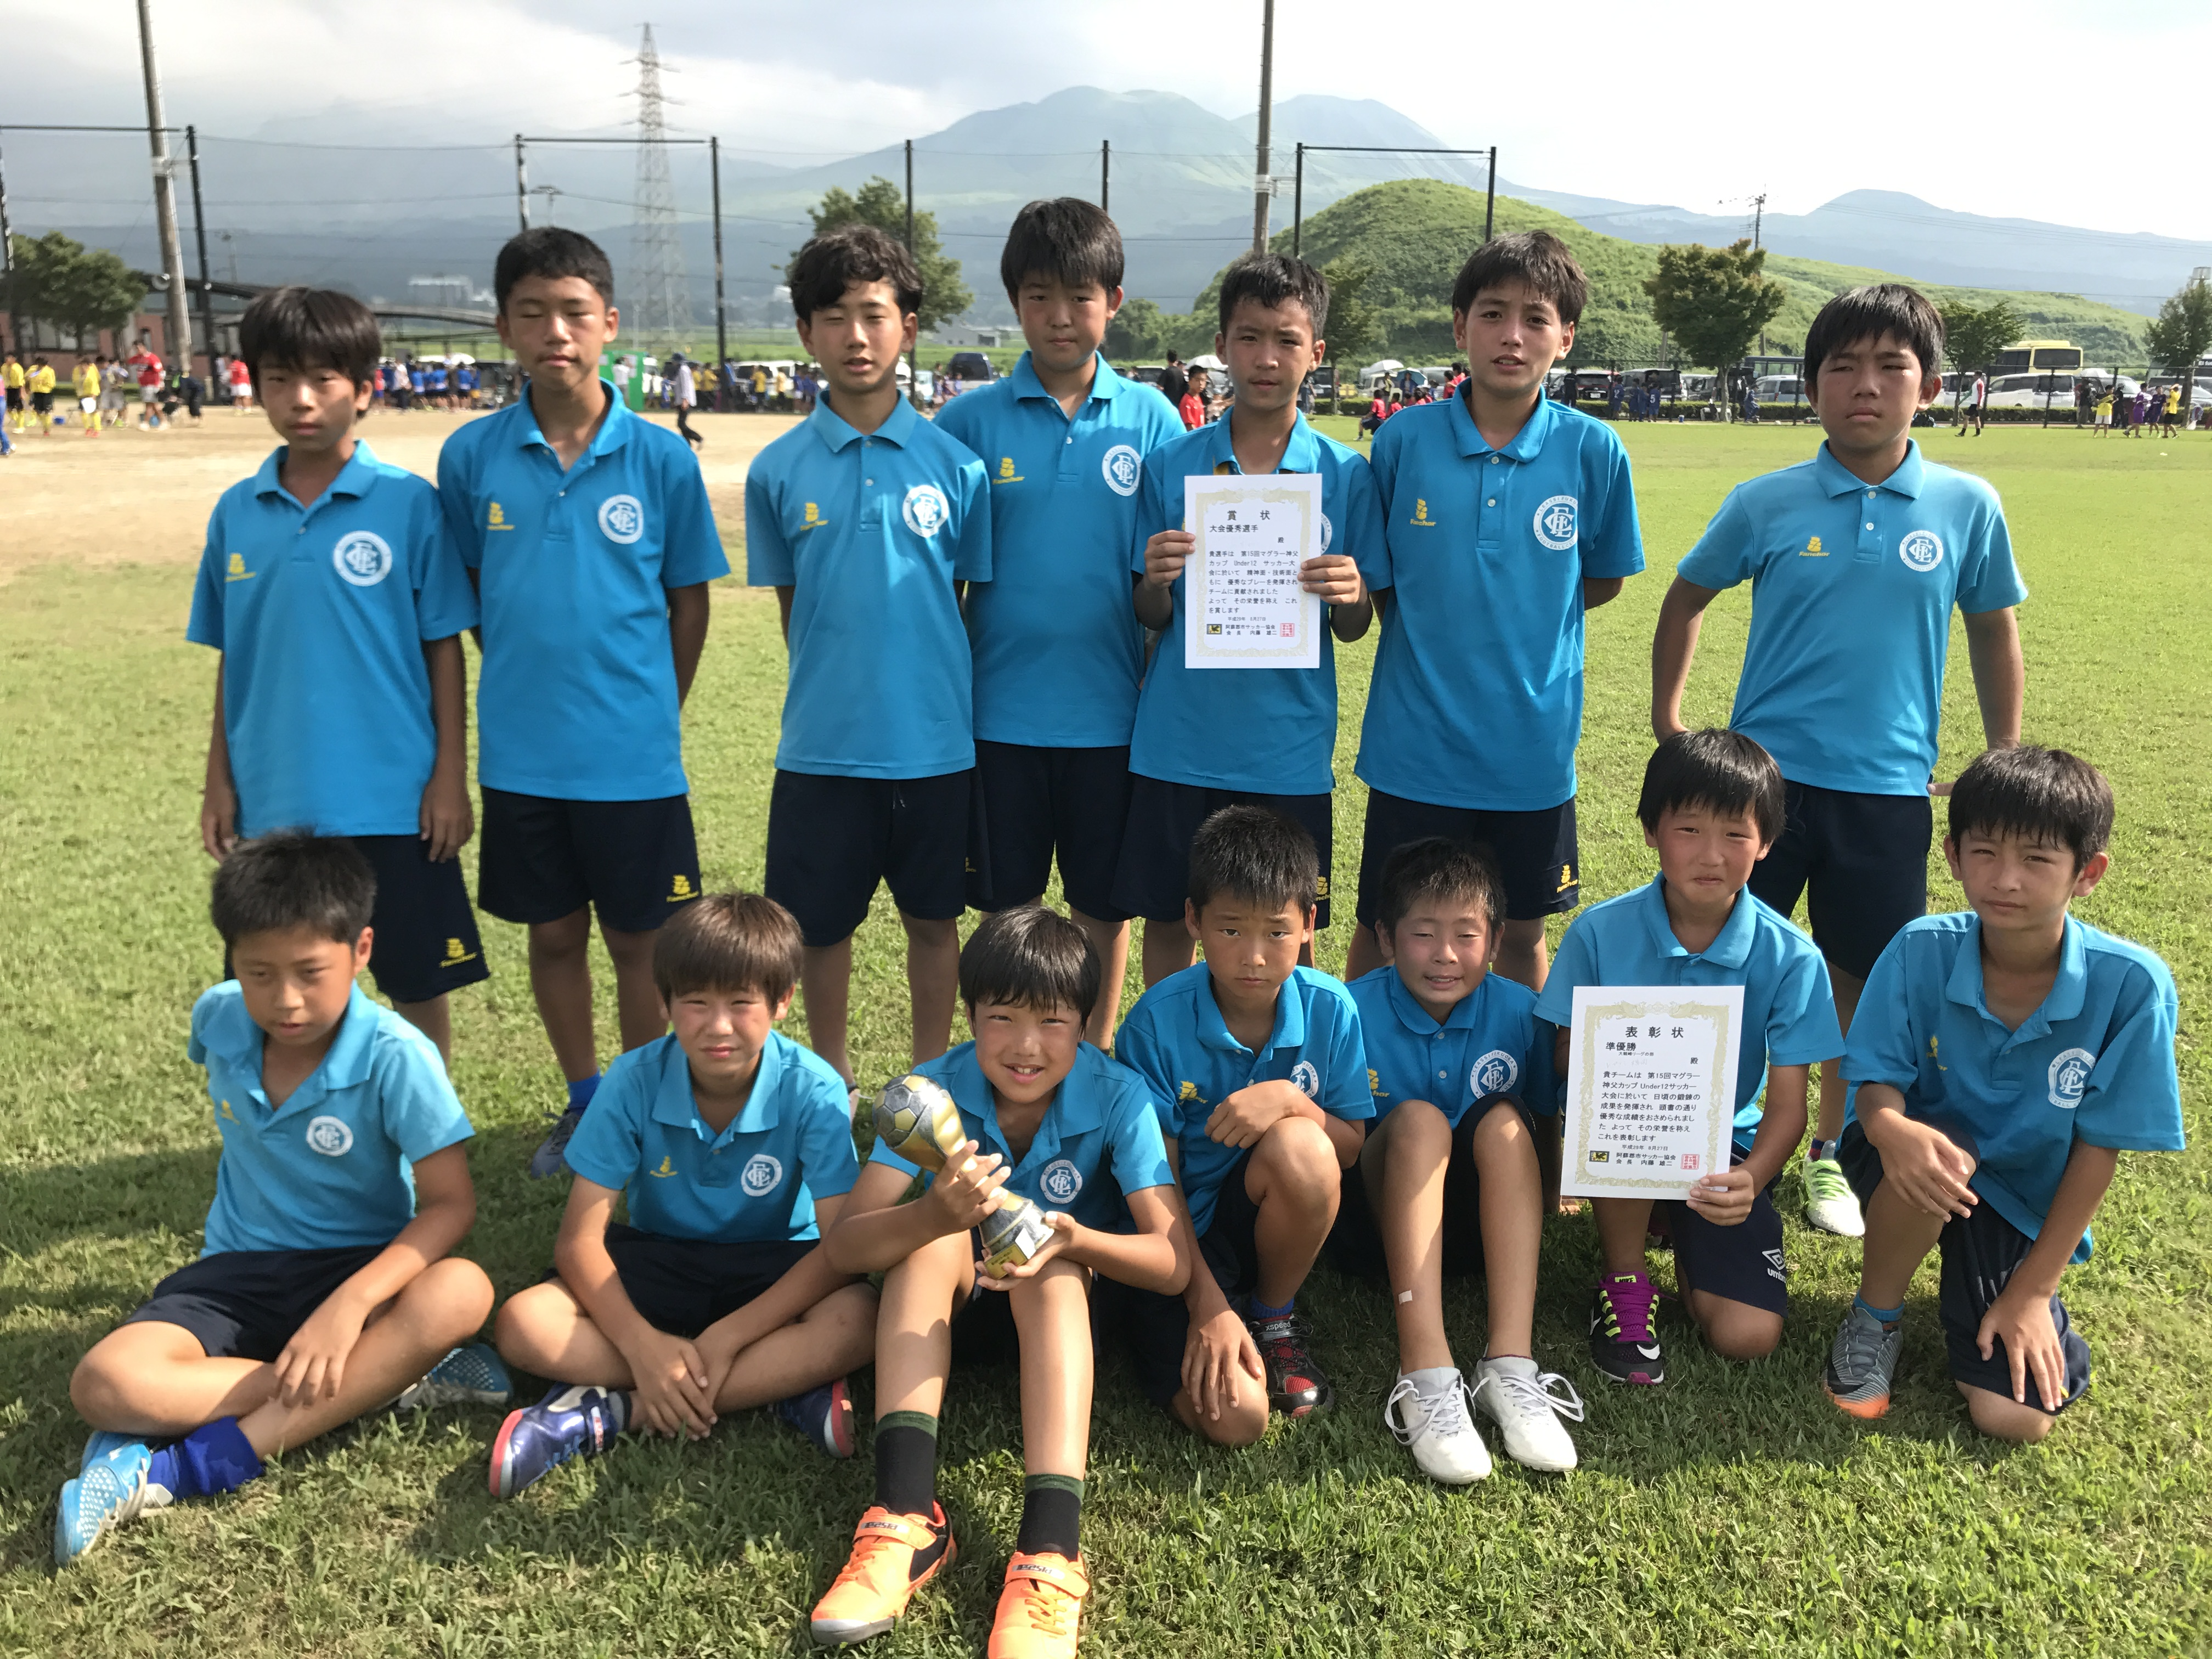 2017年度 U-12 リーグ戦 星取表!